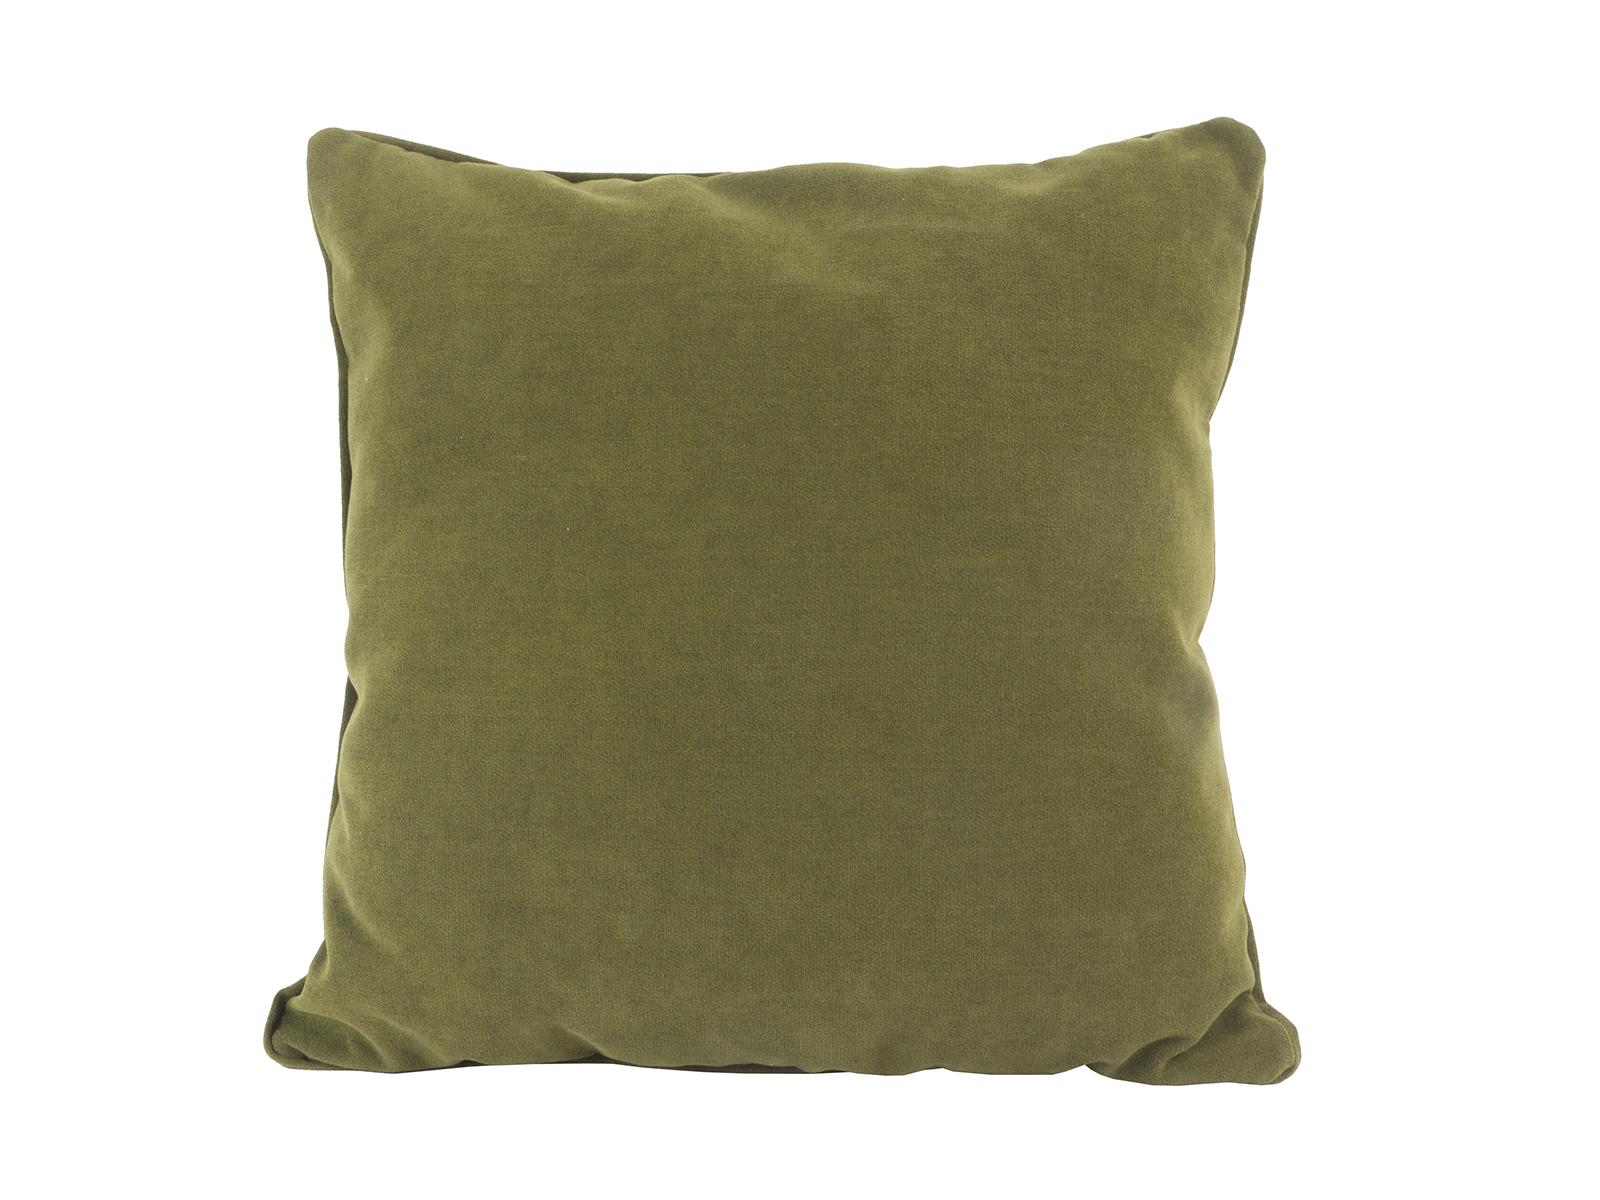 Подушка UglichДекоративные подушки<br>Декоративная подушка со съемным чехлом<br>